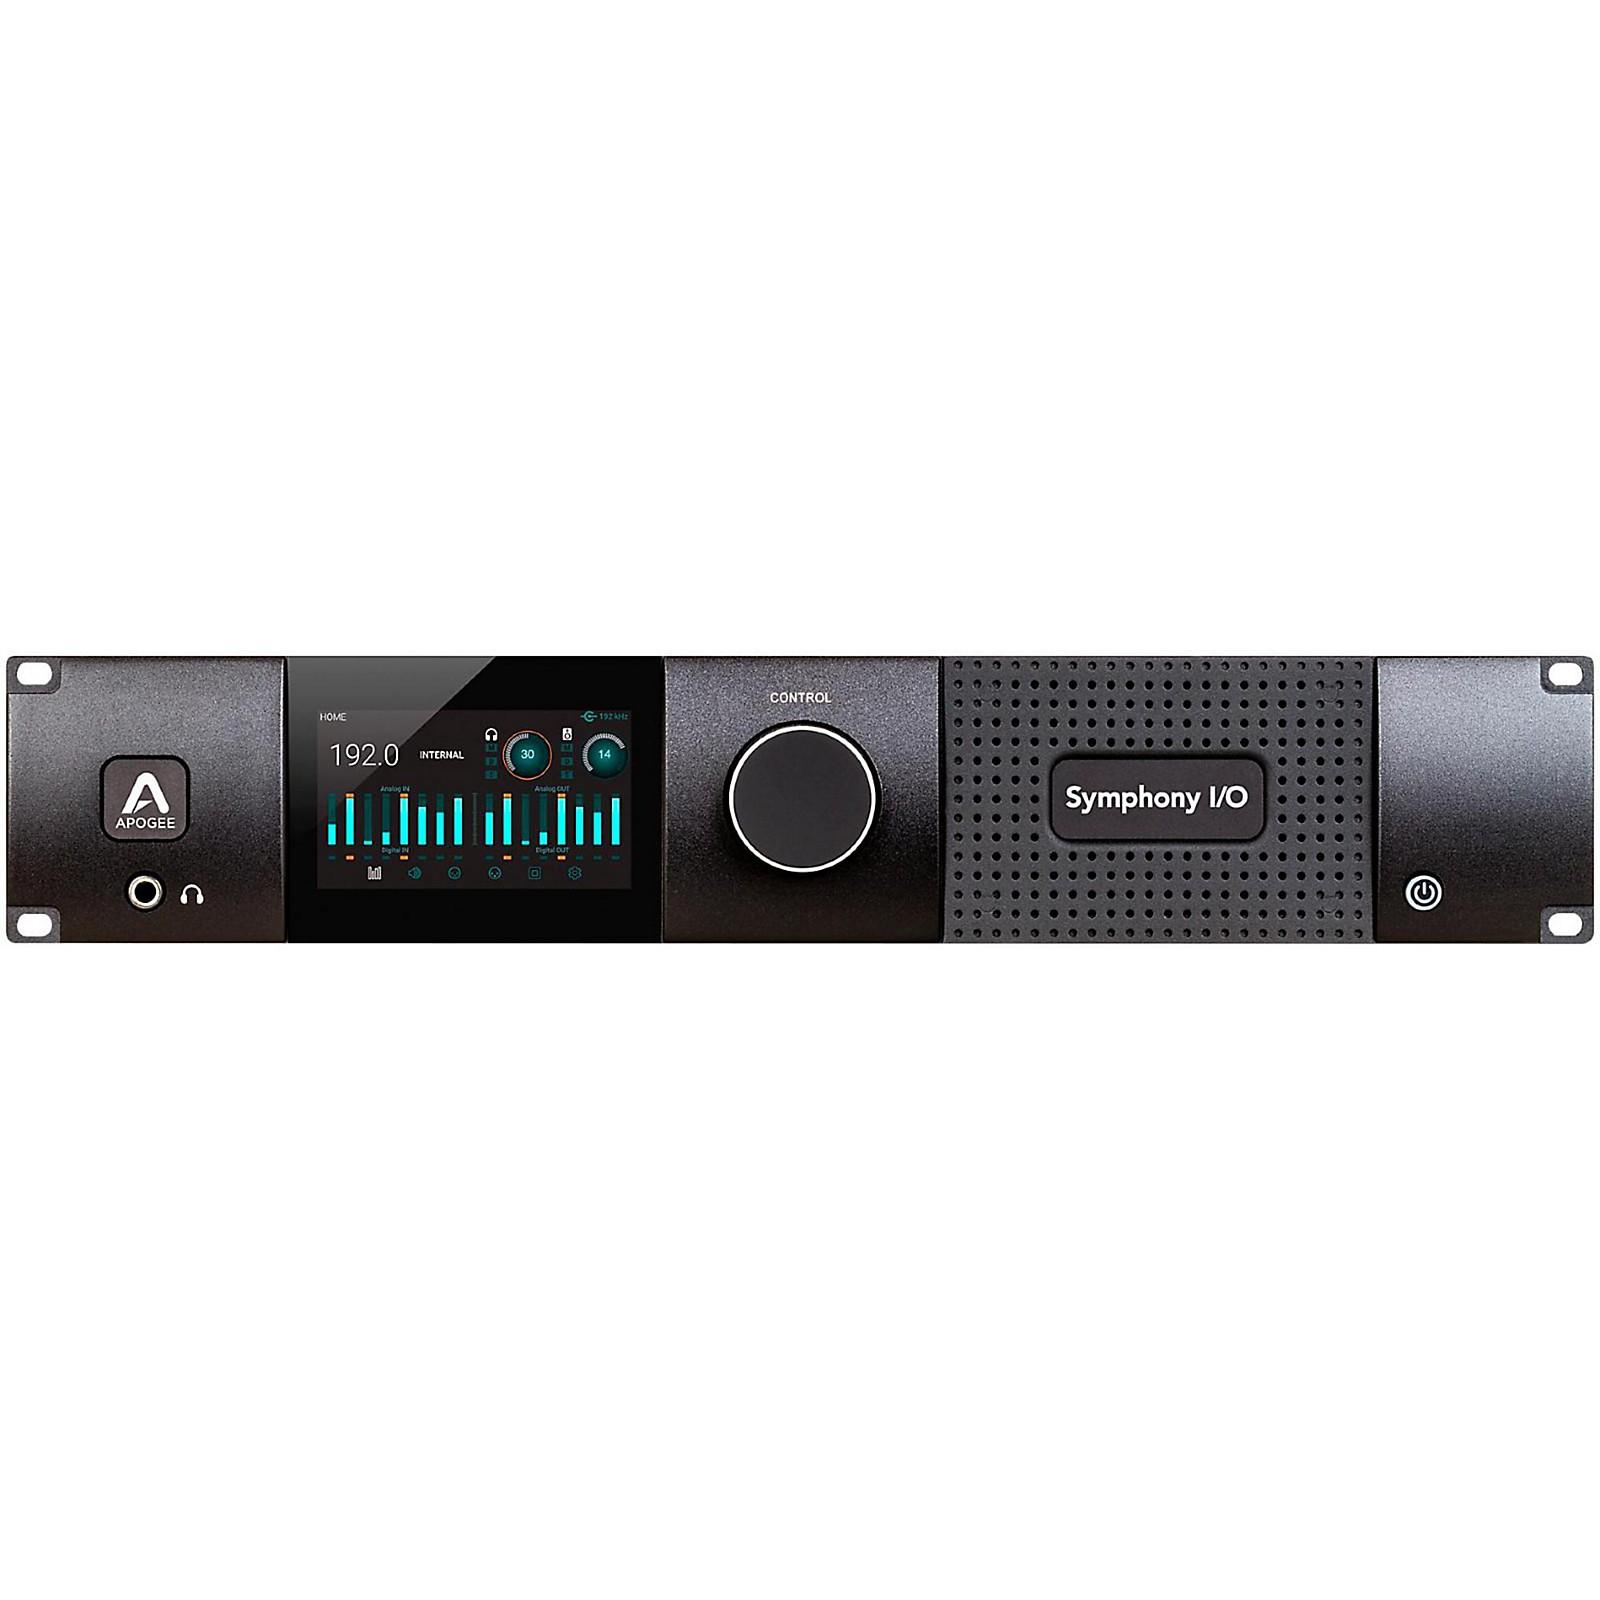 Apogee Symphony I/O MK II 8X8 Thunderbolt Audio Interface